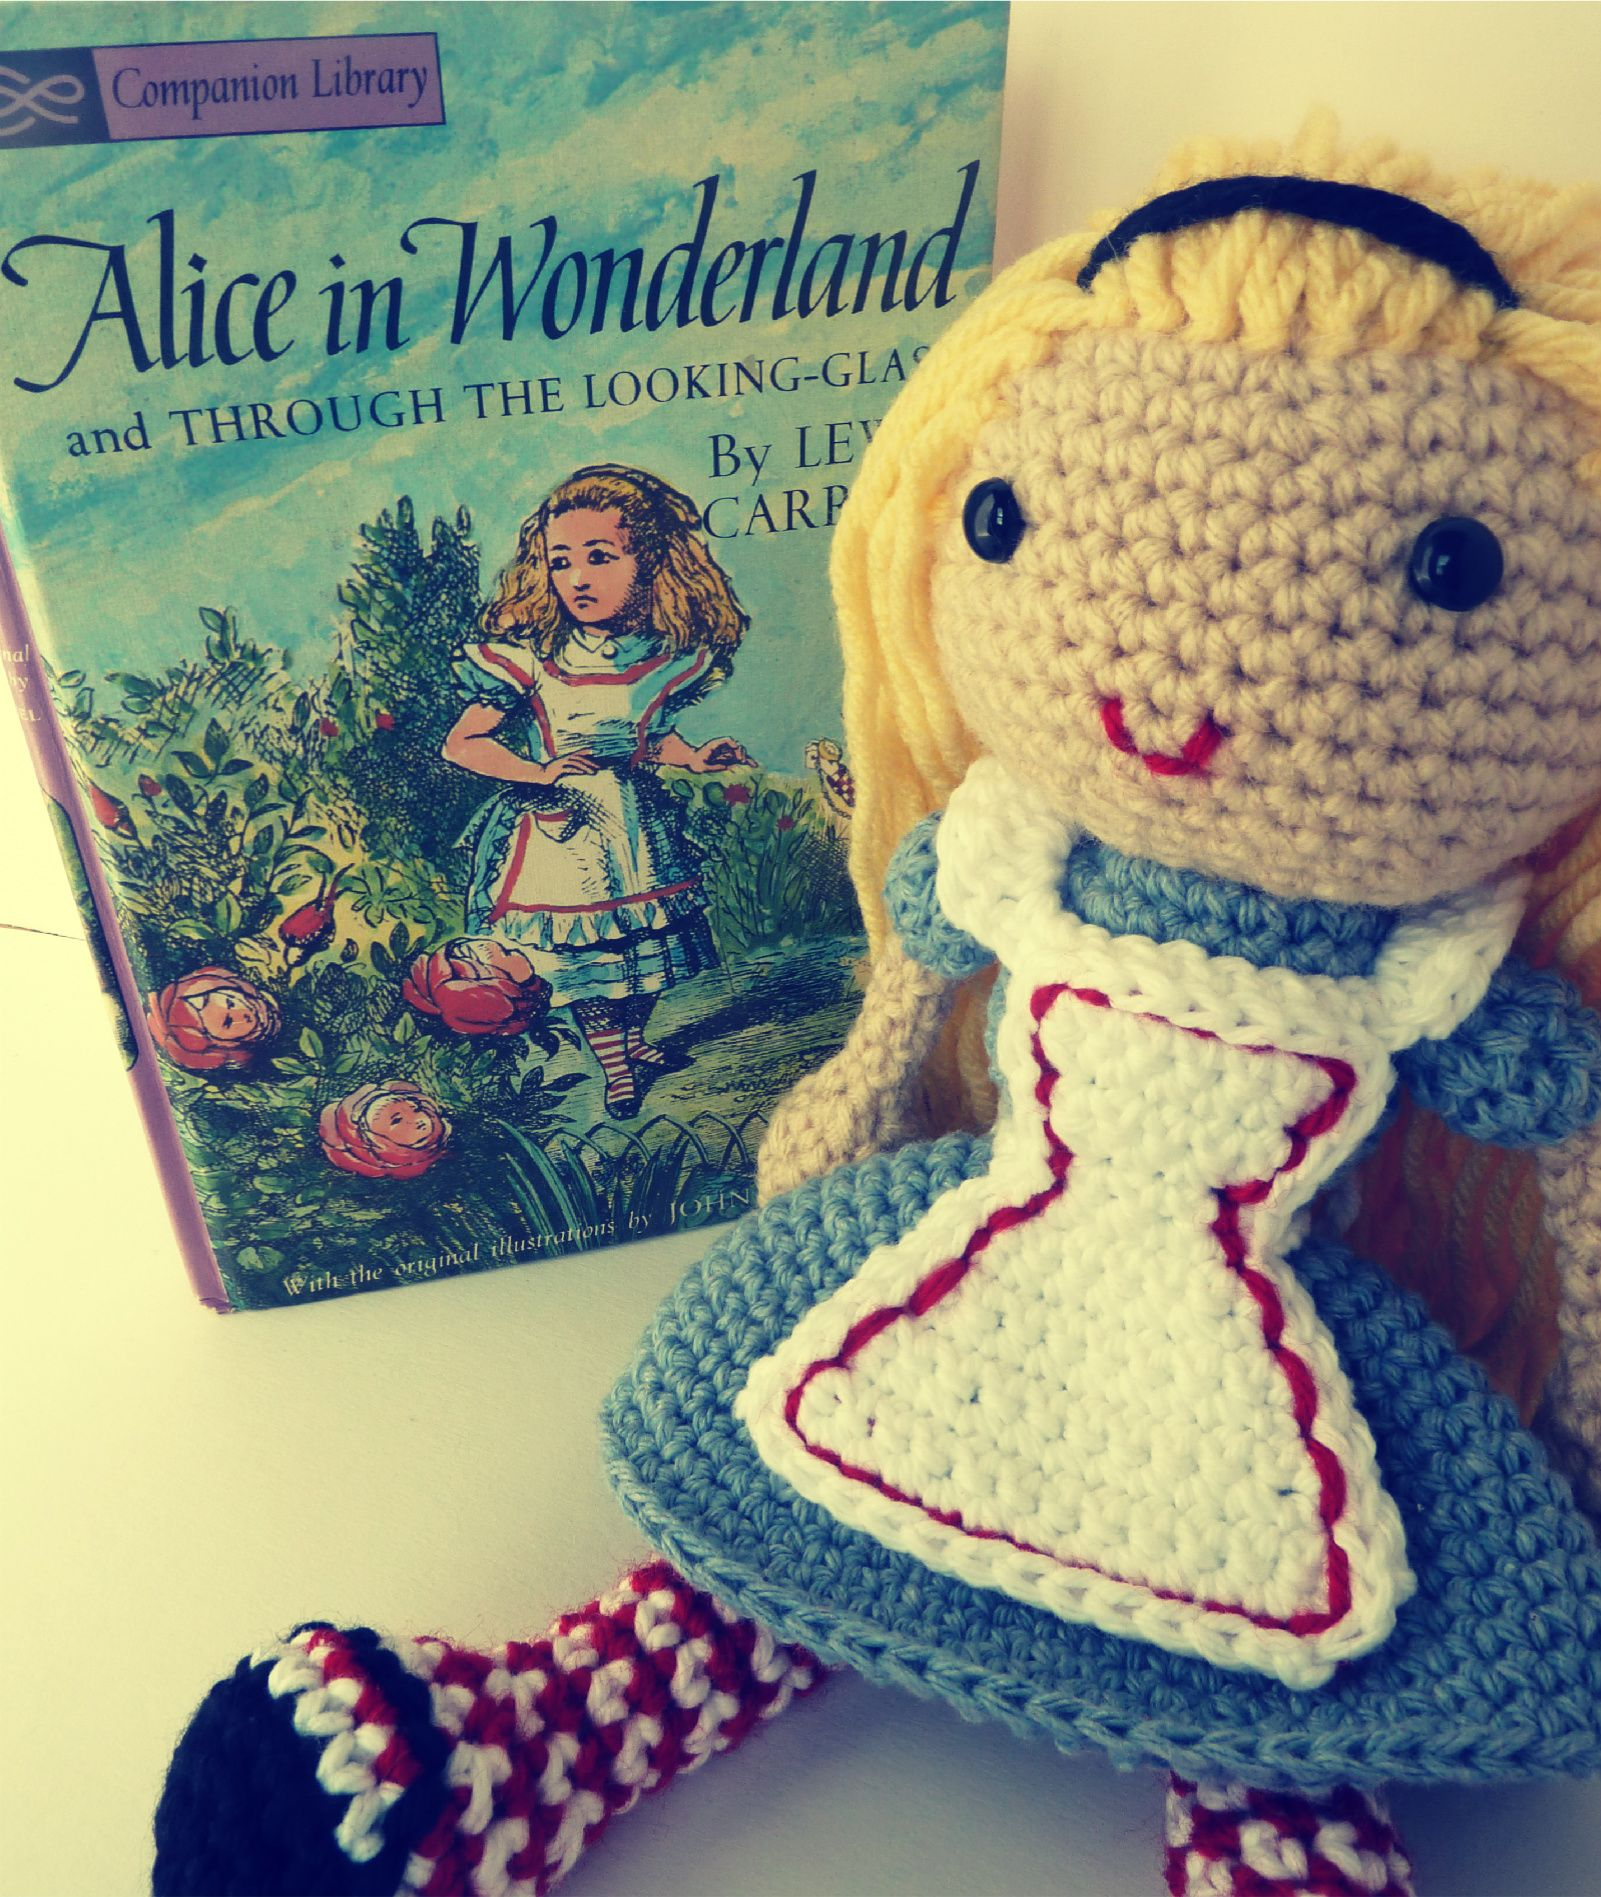 Amazon.com: Dress Up Dolls Amigurumi Crochet Patterns: 5 big dolls ... | 1897x1601